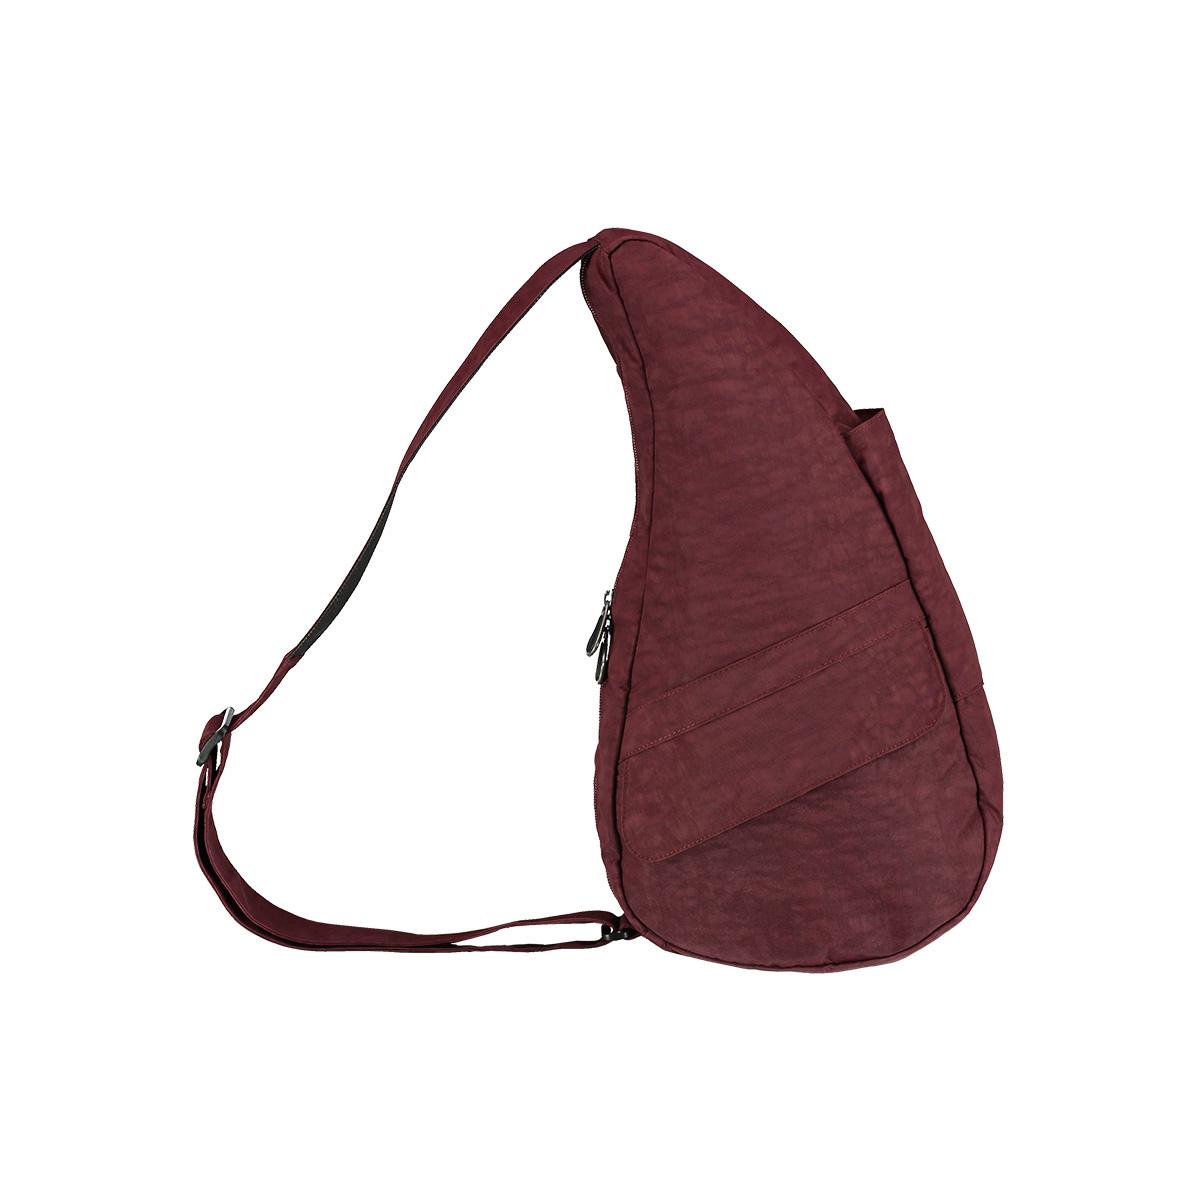 Healthy Back Bag/ヘルシーバックバッグ/ショルダーバッグ/ボディバッグ/旅行バッグ/軽量/レディース/メンズ 《限定ポーチ付》 公式ストア ヘルシーバックバッグ テクスチャードナイロン Sサイズ6303 フィグ